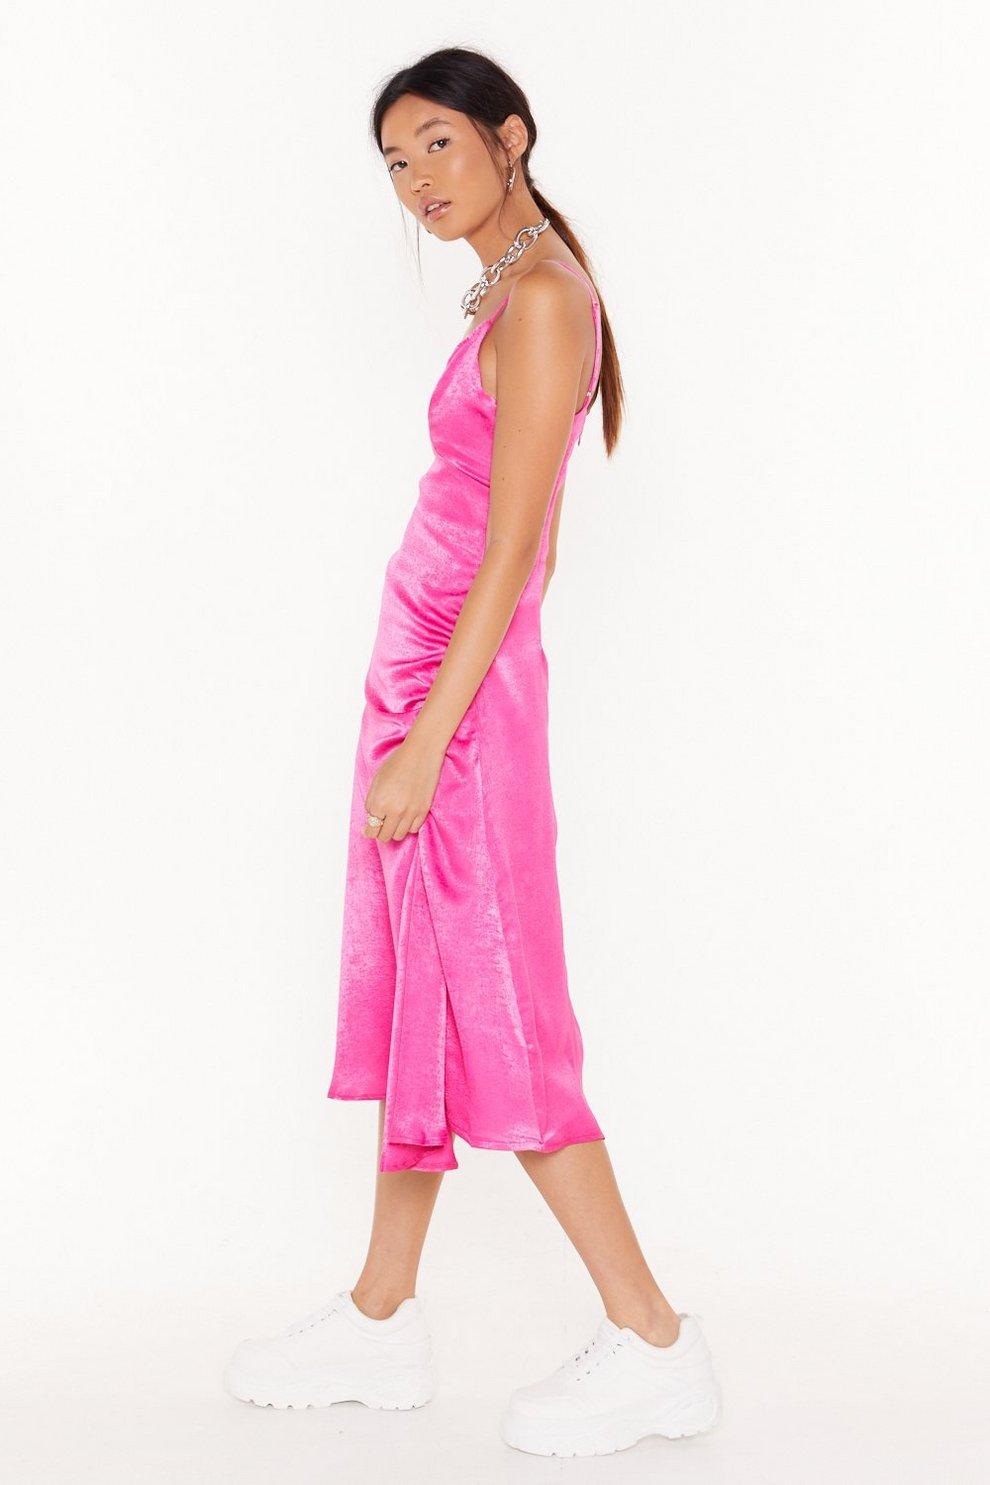 e3c51c06f67e4 City Slicker Satin Midi Dress | Shop Clothes at Nasty Gal!